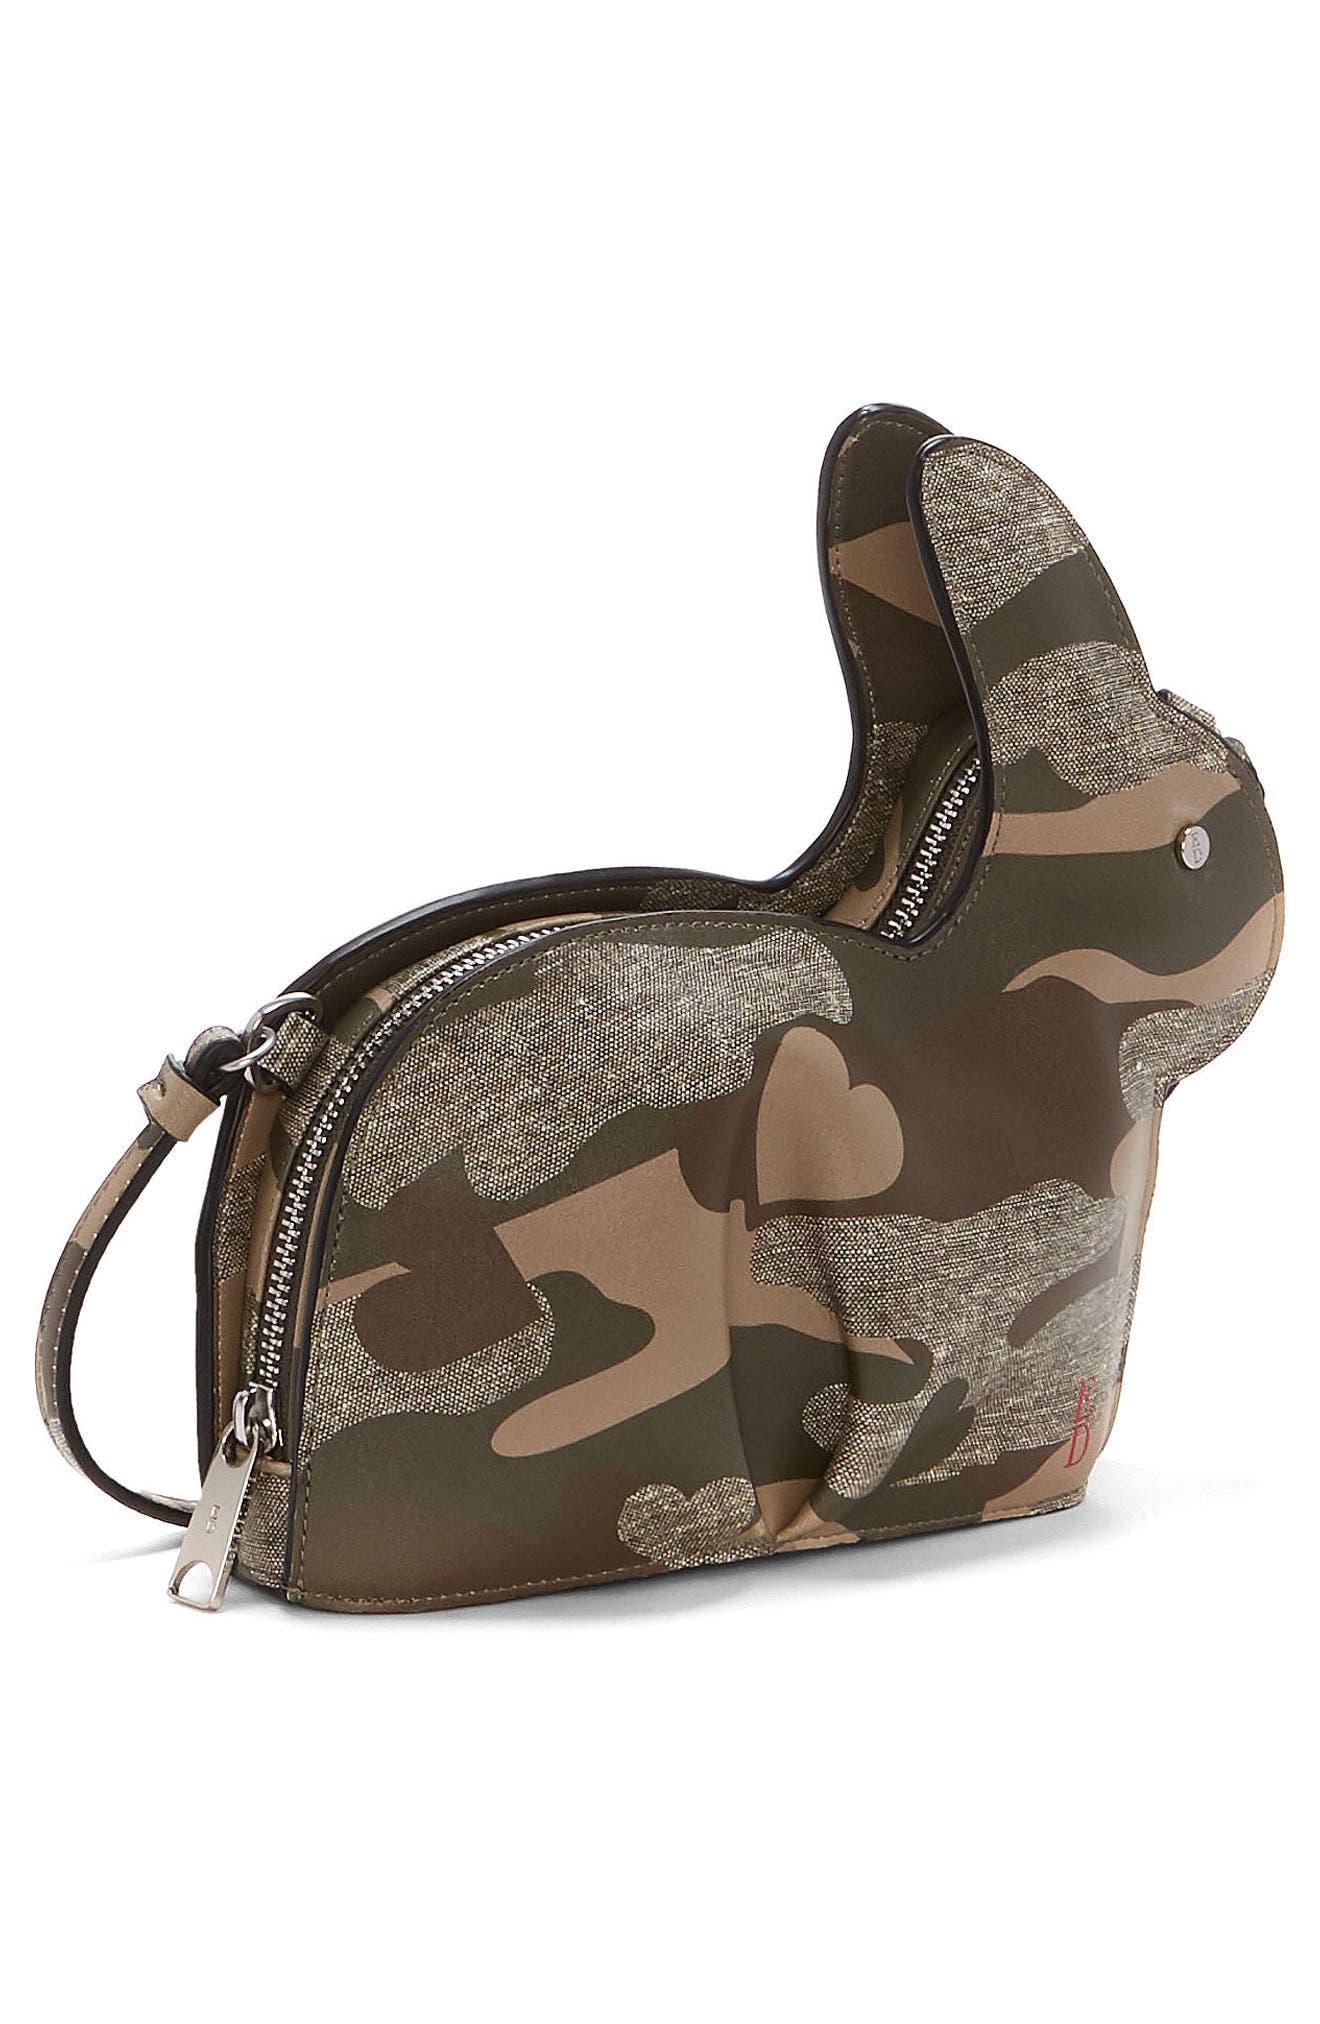 Carot Faux Leather Crossbody Bag,                             Alternate thumbnail 4, color,                             300